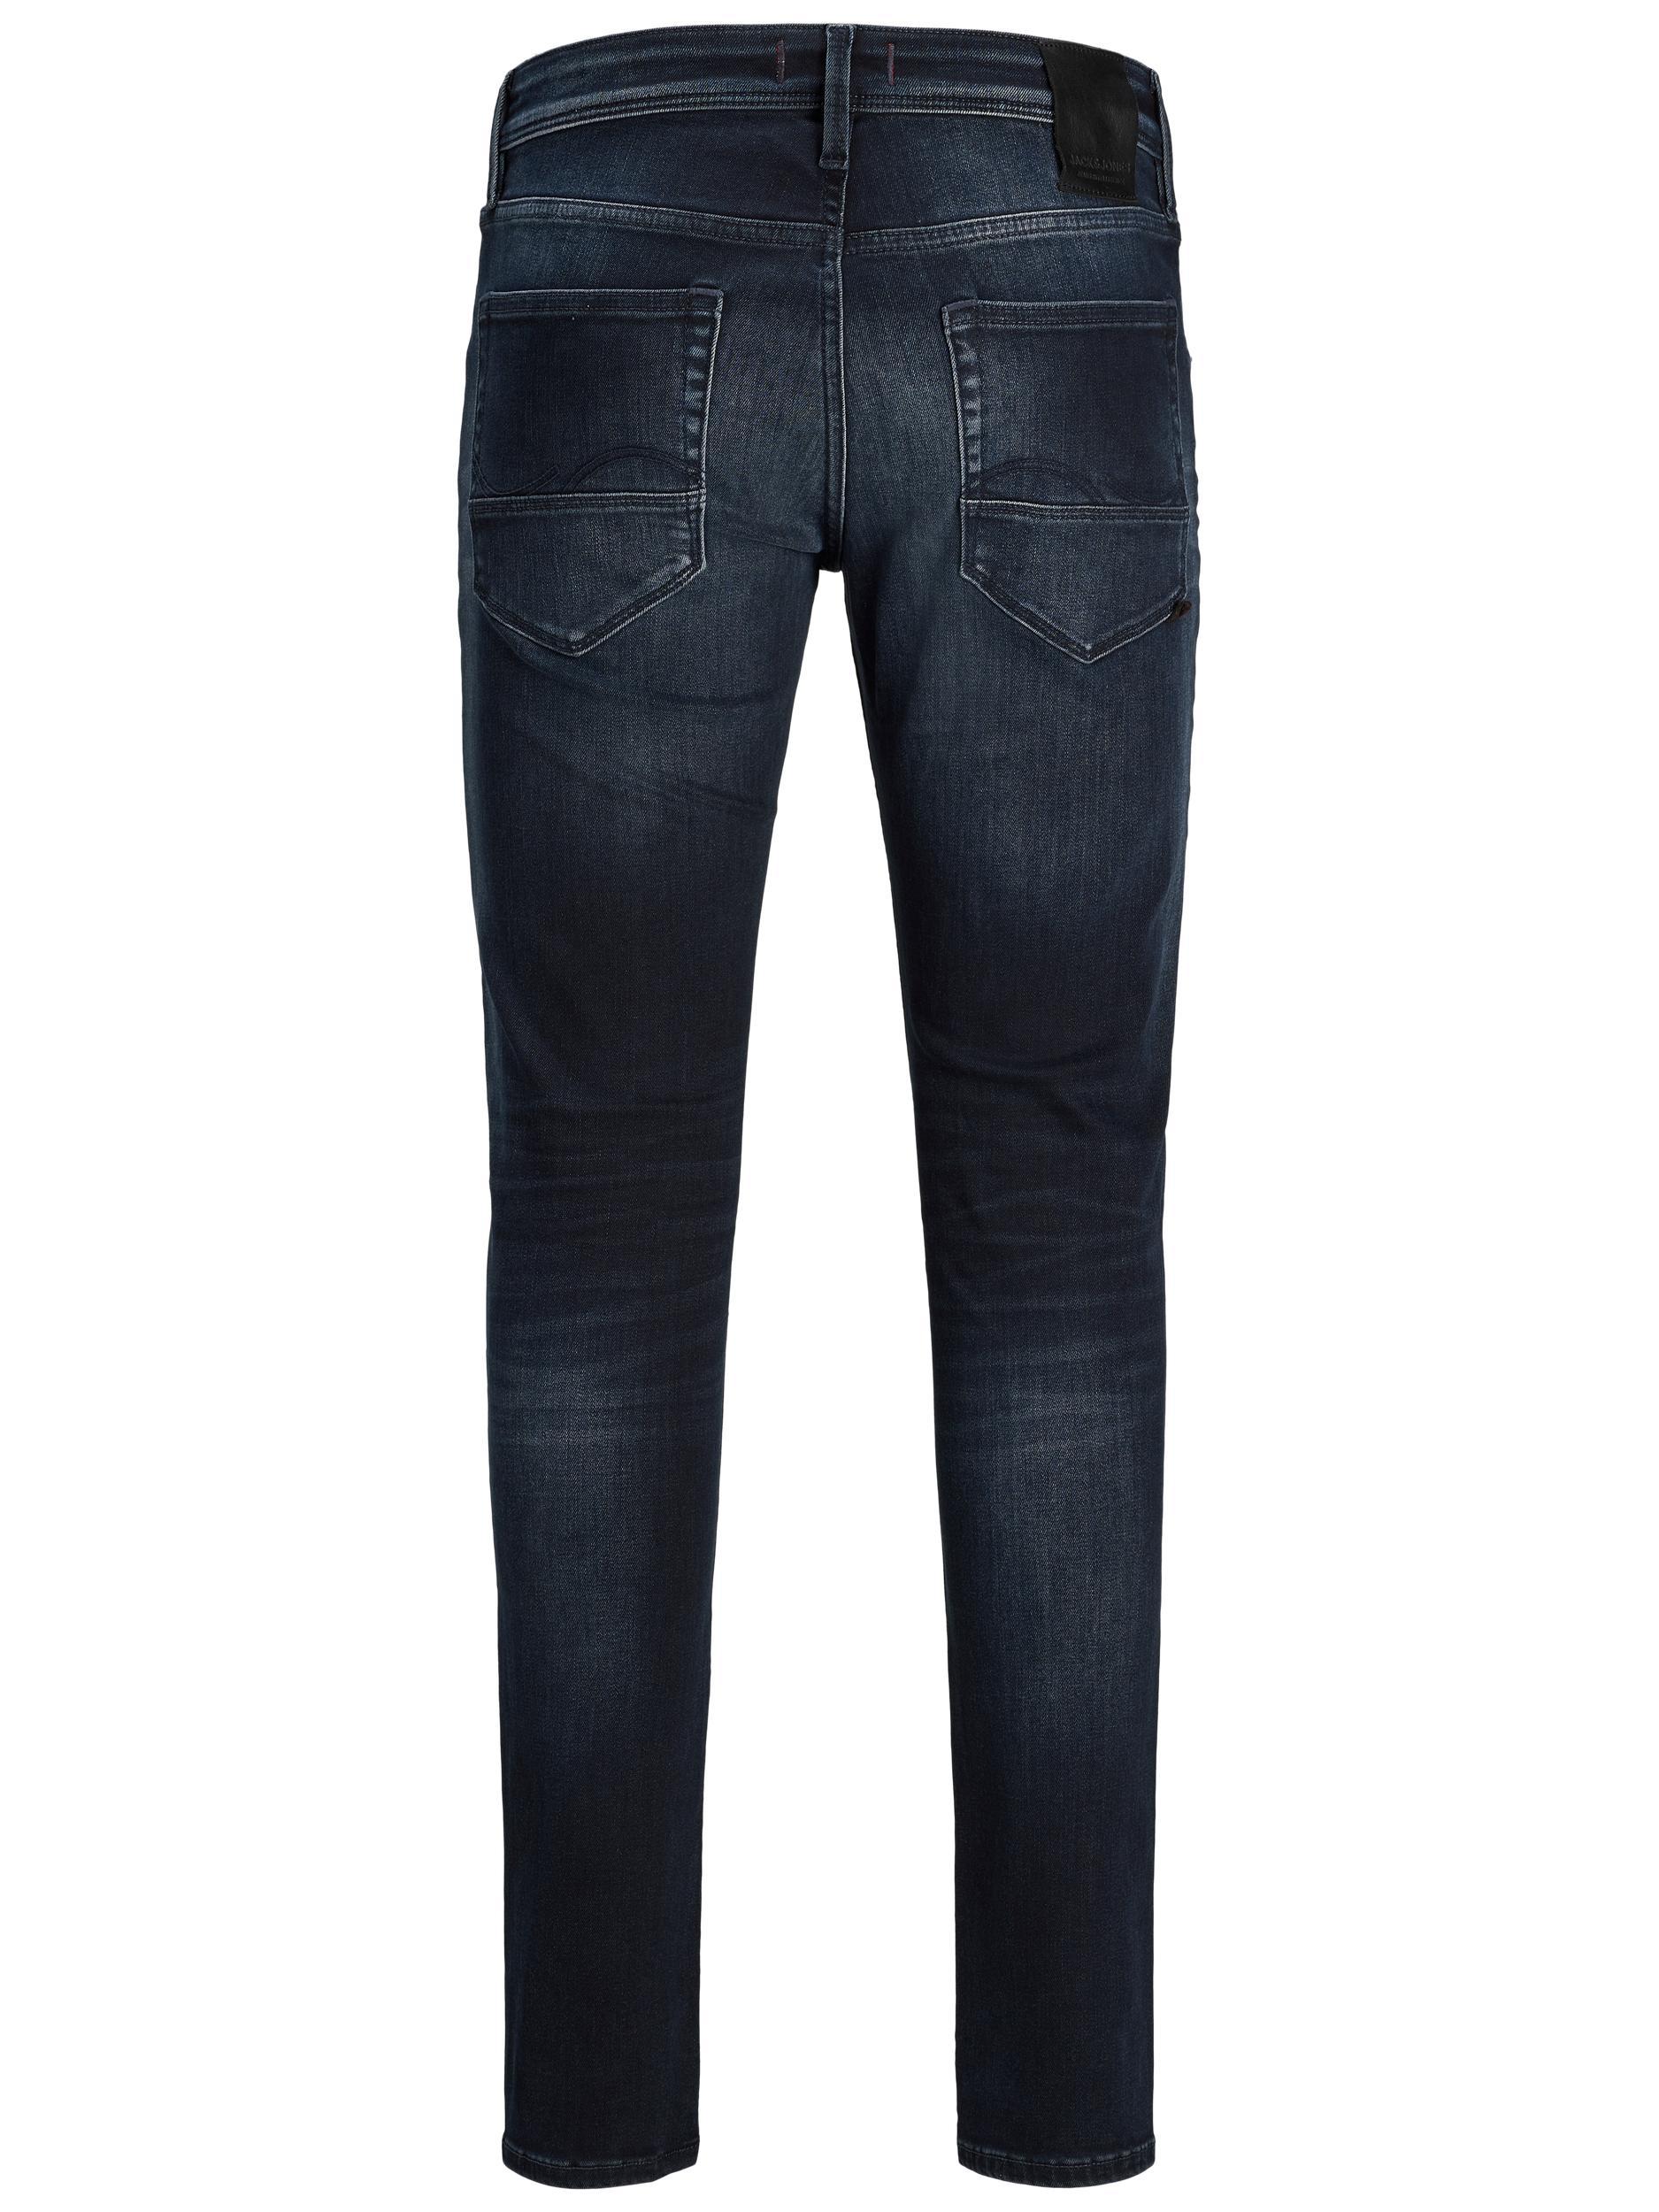 Jack & Jones Glen Fox 104 jeans, blue denim, 33/32